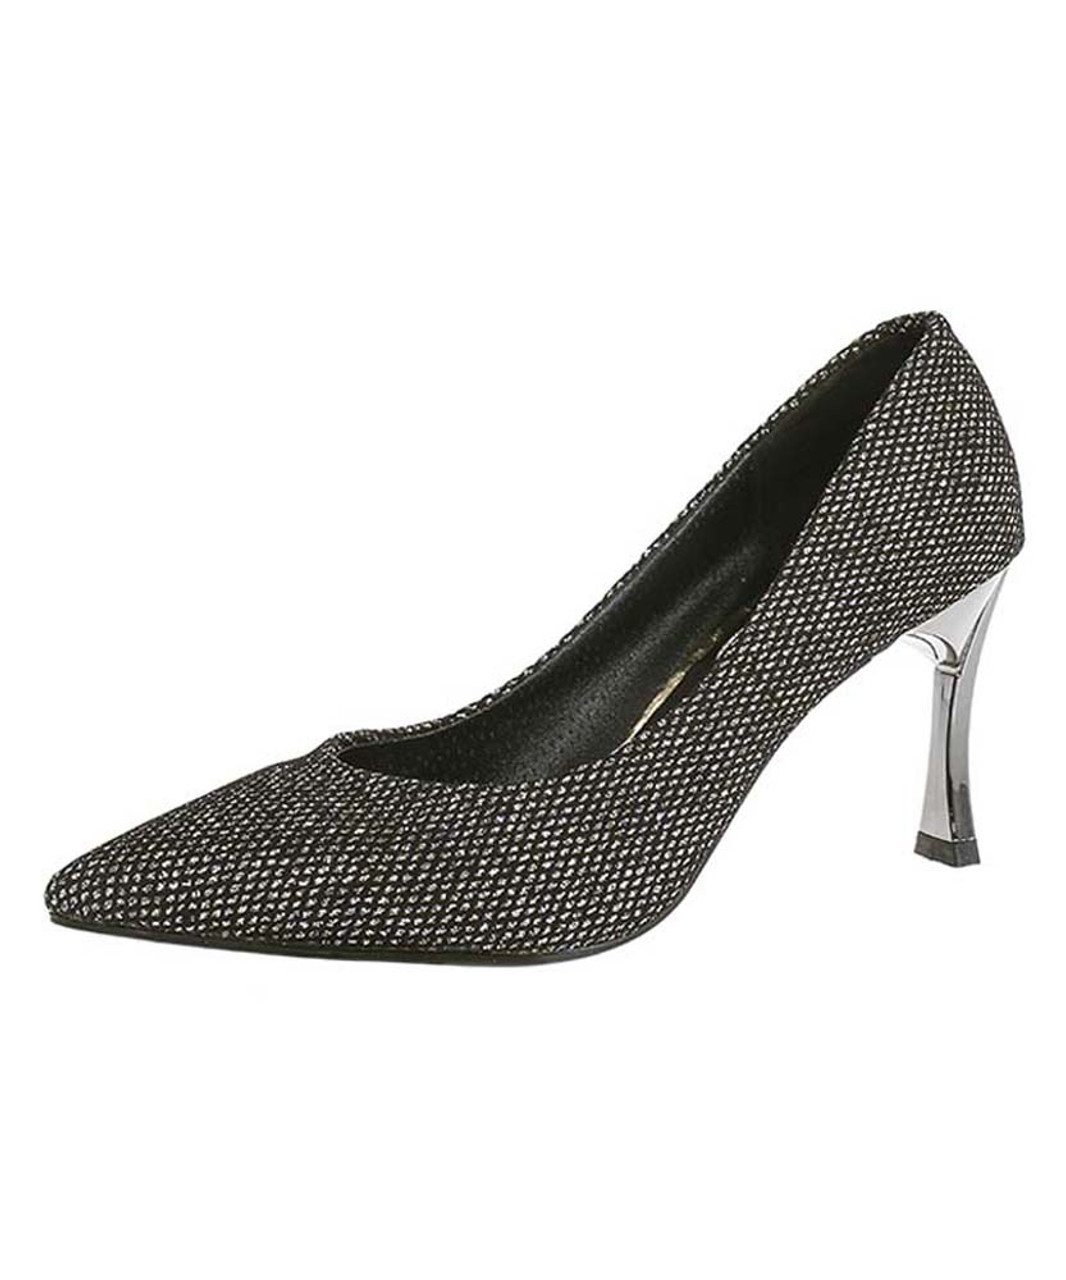 spot National flag Every year  Silver suede slip on slim high heel dress shoe 2188 | Womens heel dress  shoes online 2188WS